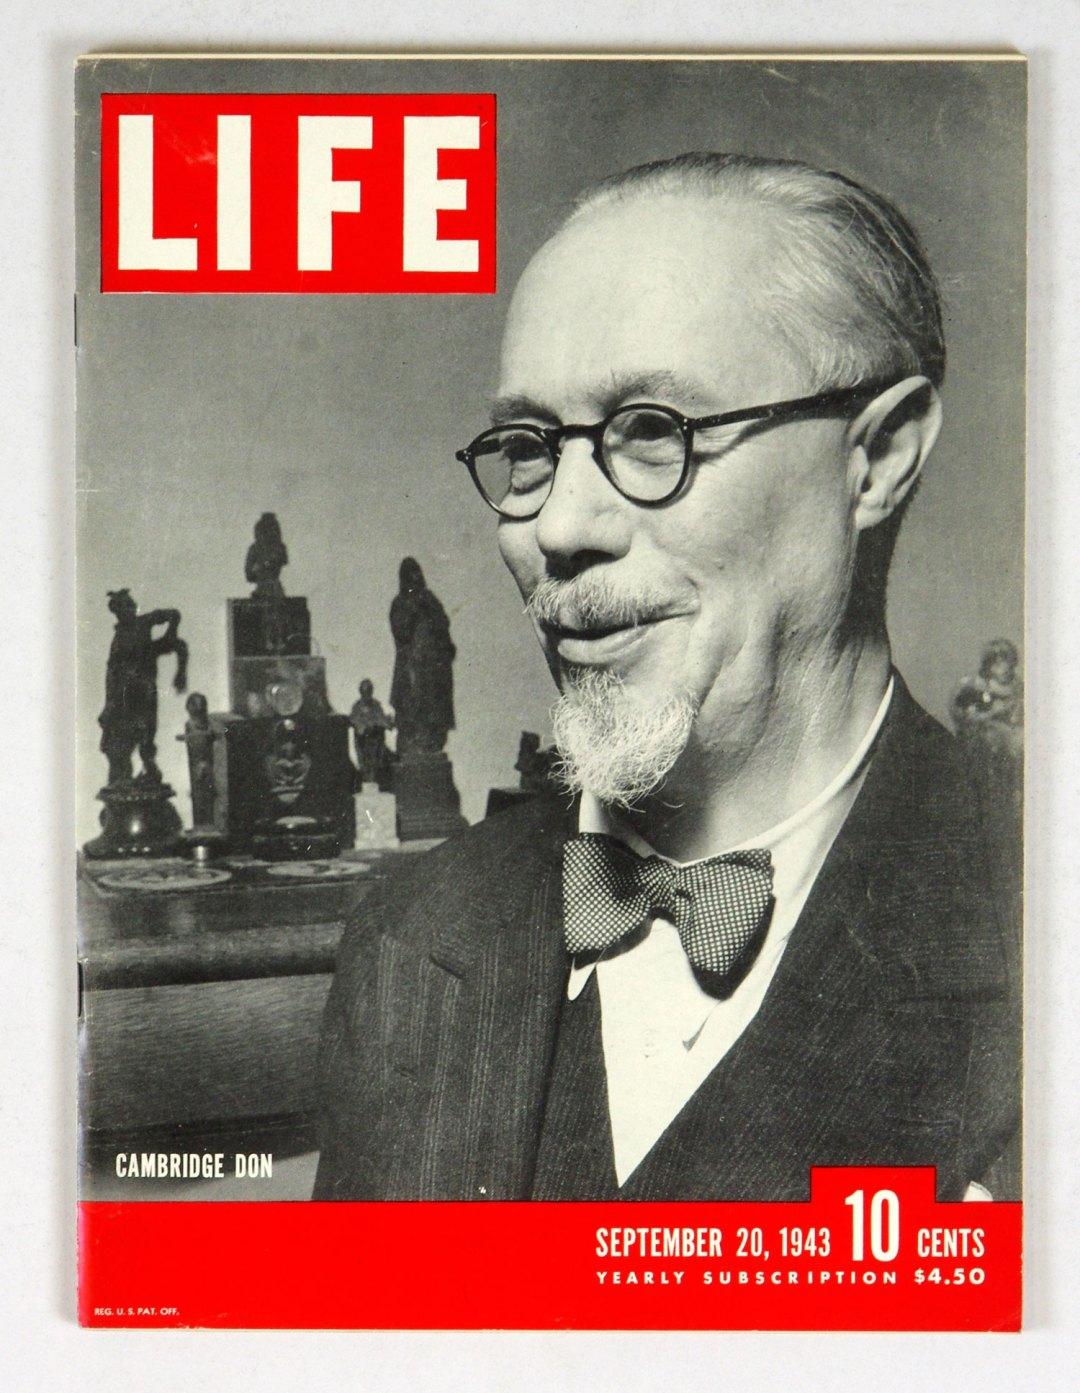 LIFE Magazine 1943 September 20 Cambridge Don